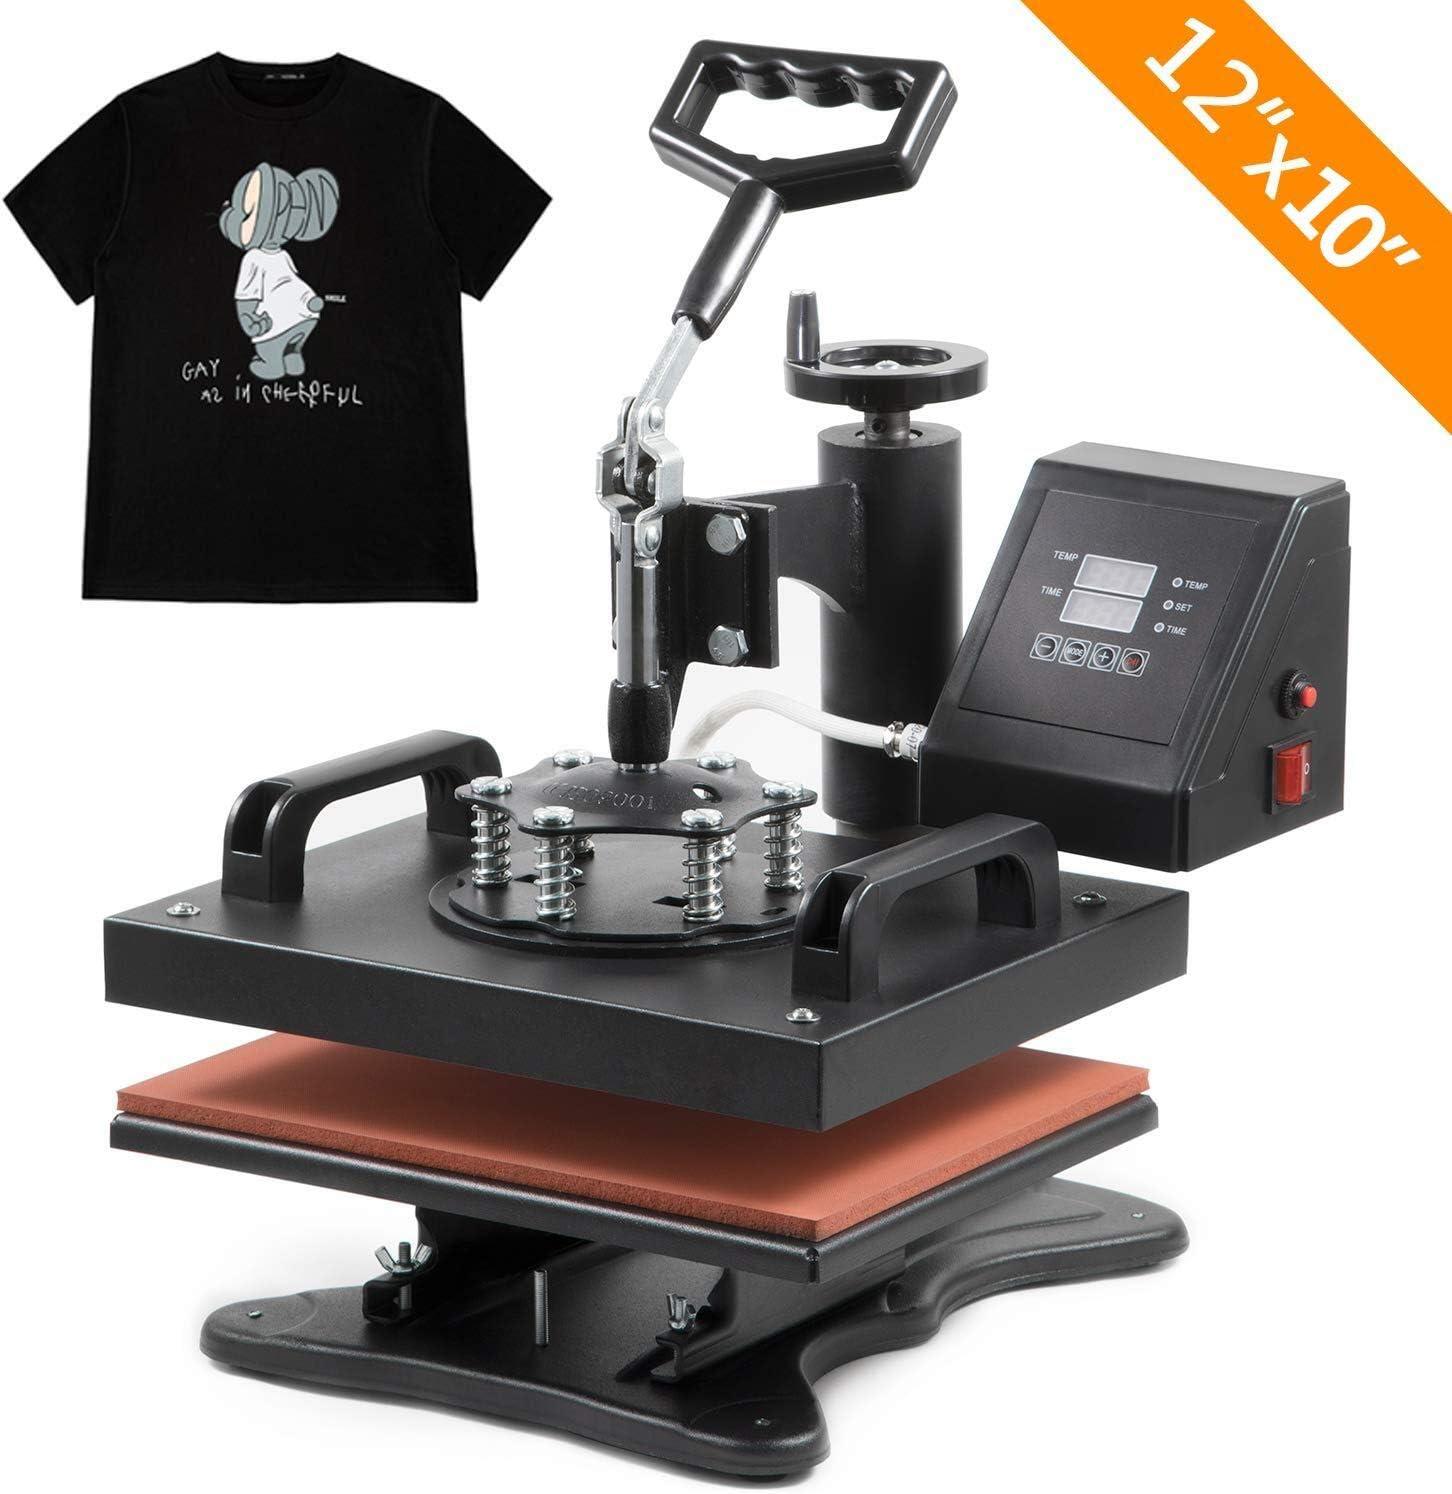 Hot Clamshell Digital Heat Press Machine T-shirt Transfer Sublimation DIY New